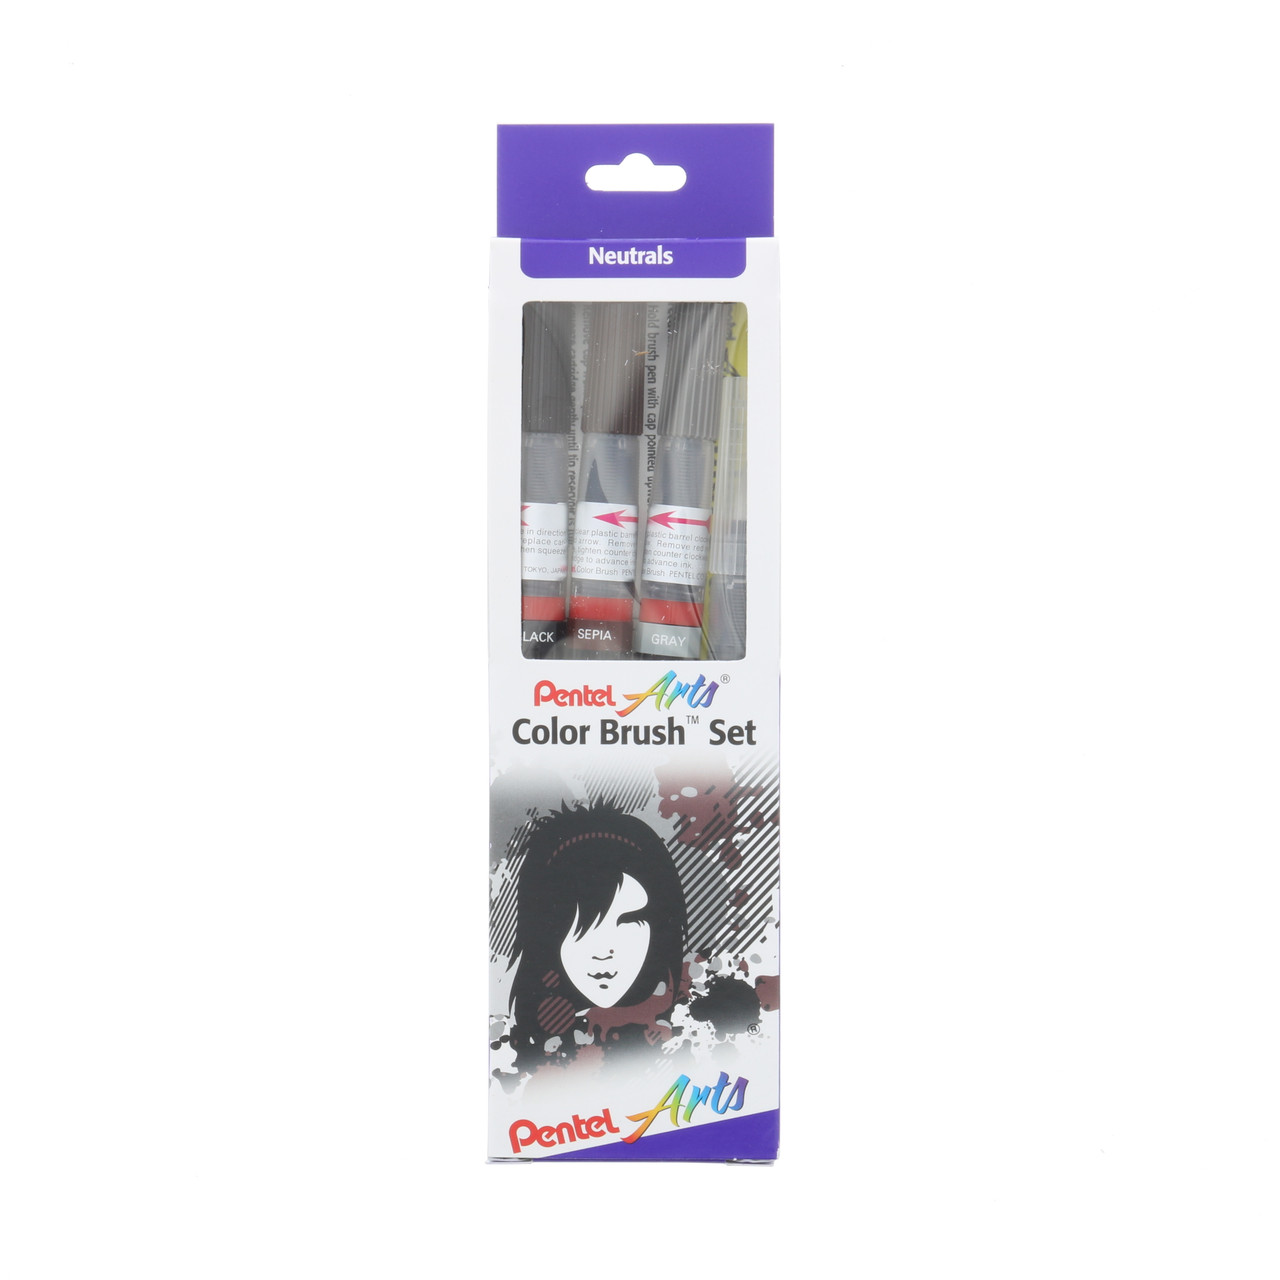 Pentel Color Brush Set